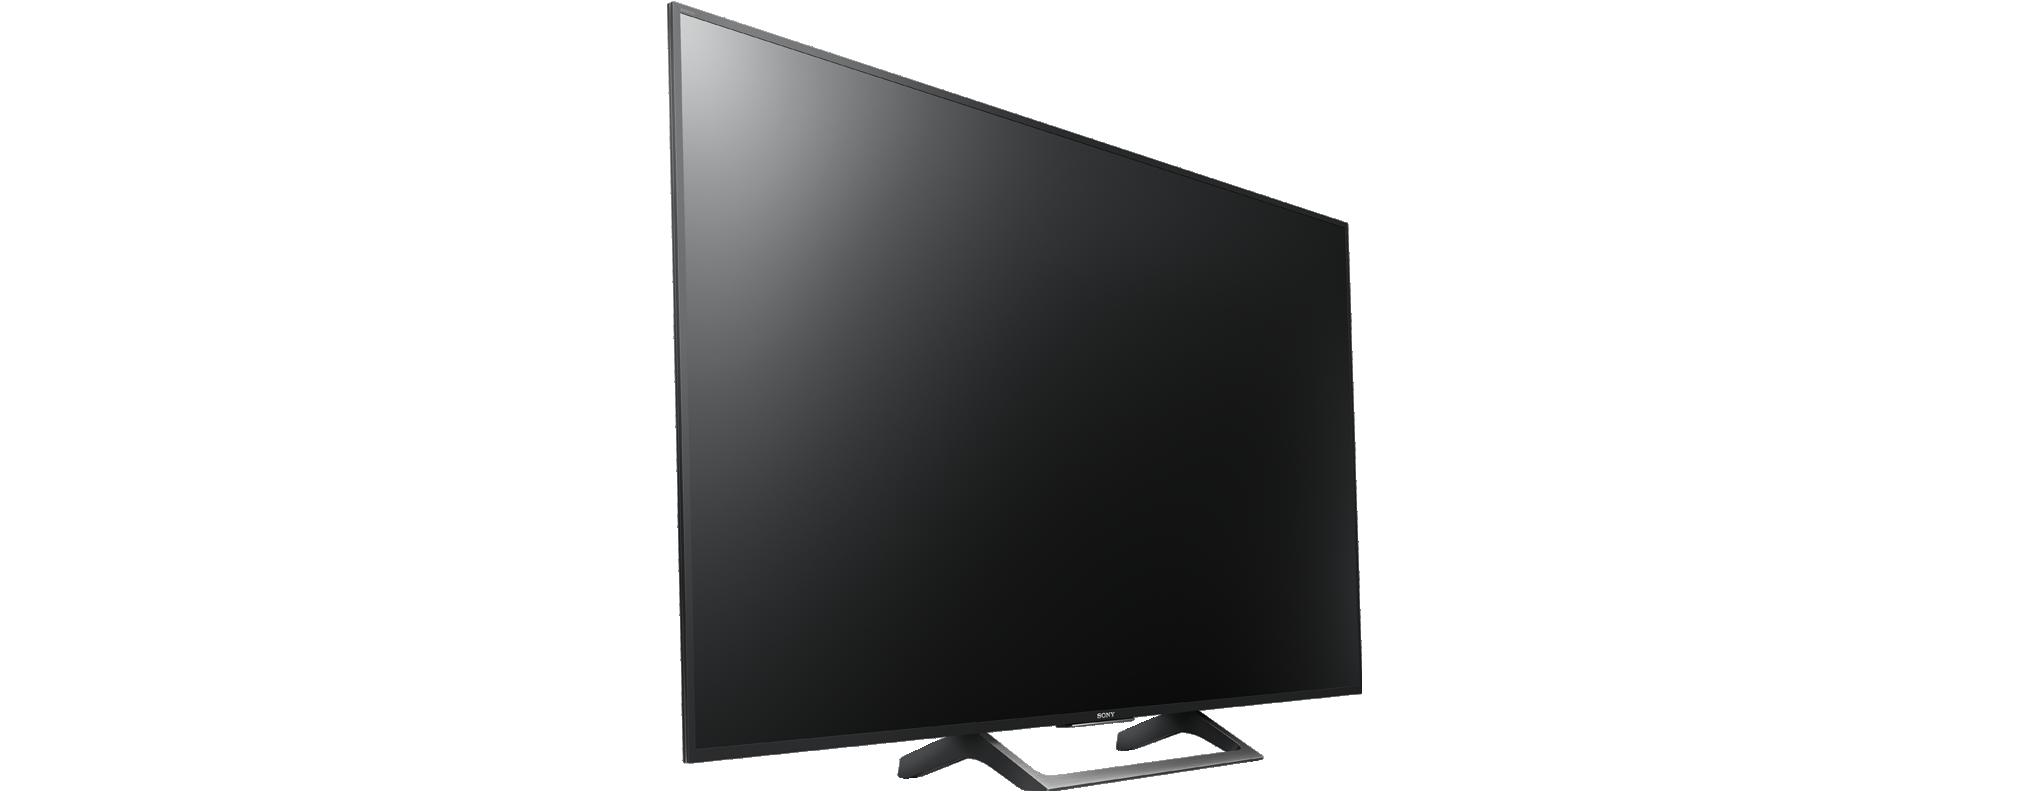 Sony 65 X7000e 4k Ultra Hd Led Lcd Smart Tv Tvs Tvs Tv Blu  # Ensembles Tv